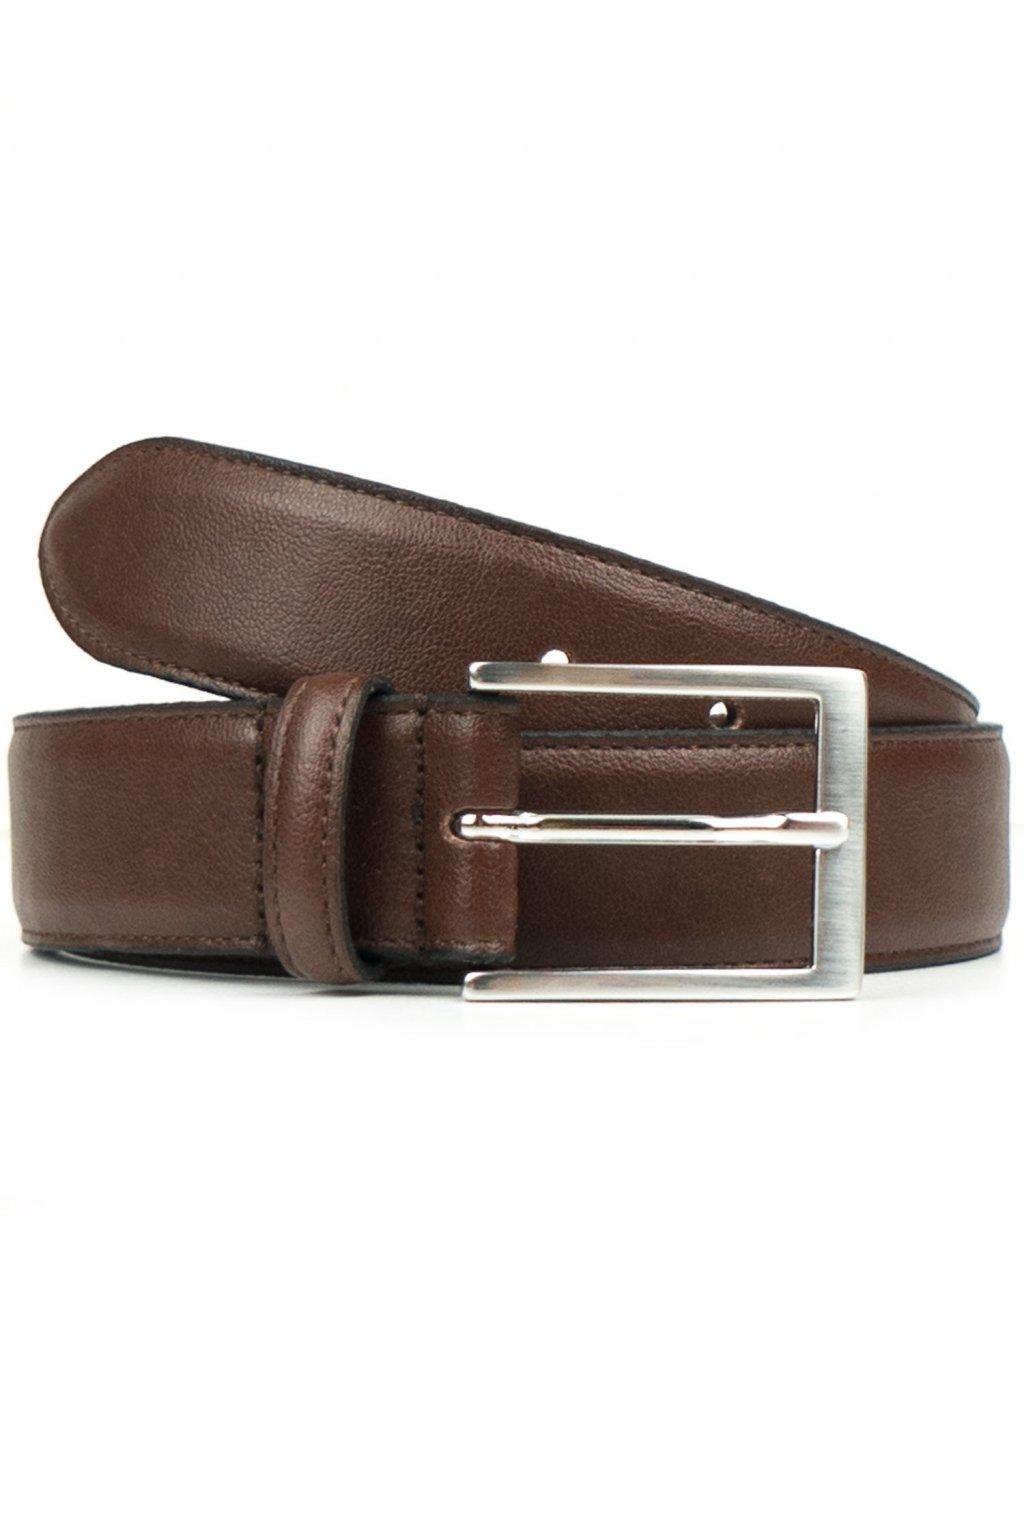 "Hnedý opasok ""Classic 3,5cm Belt Chestnut"""